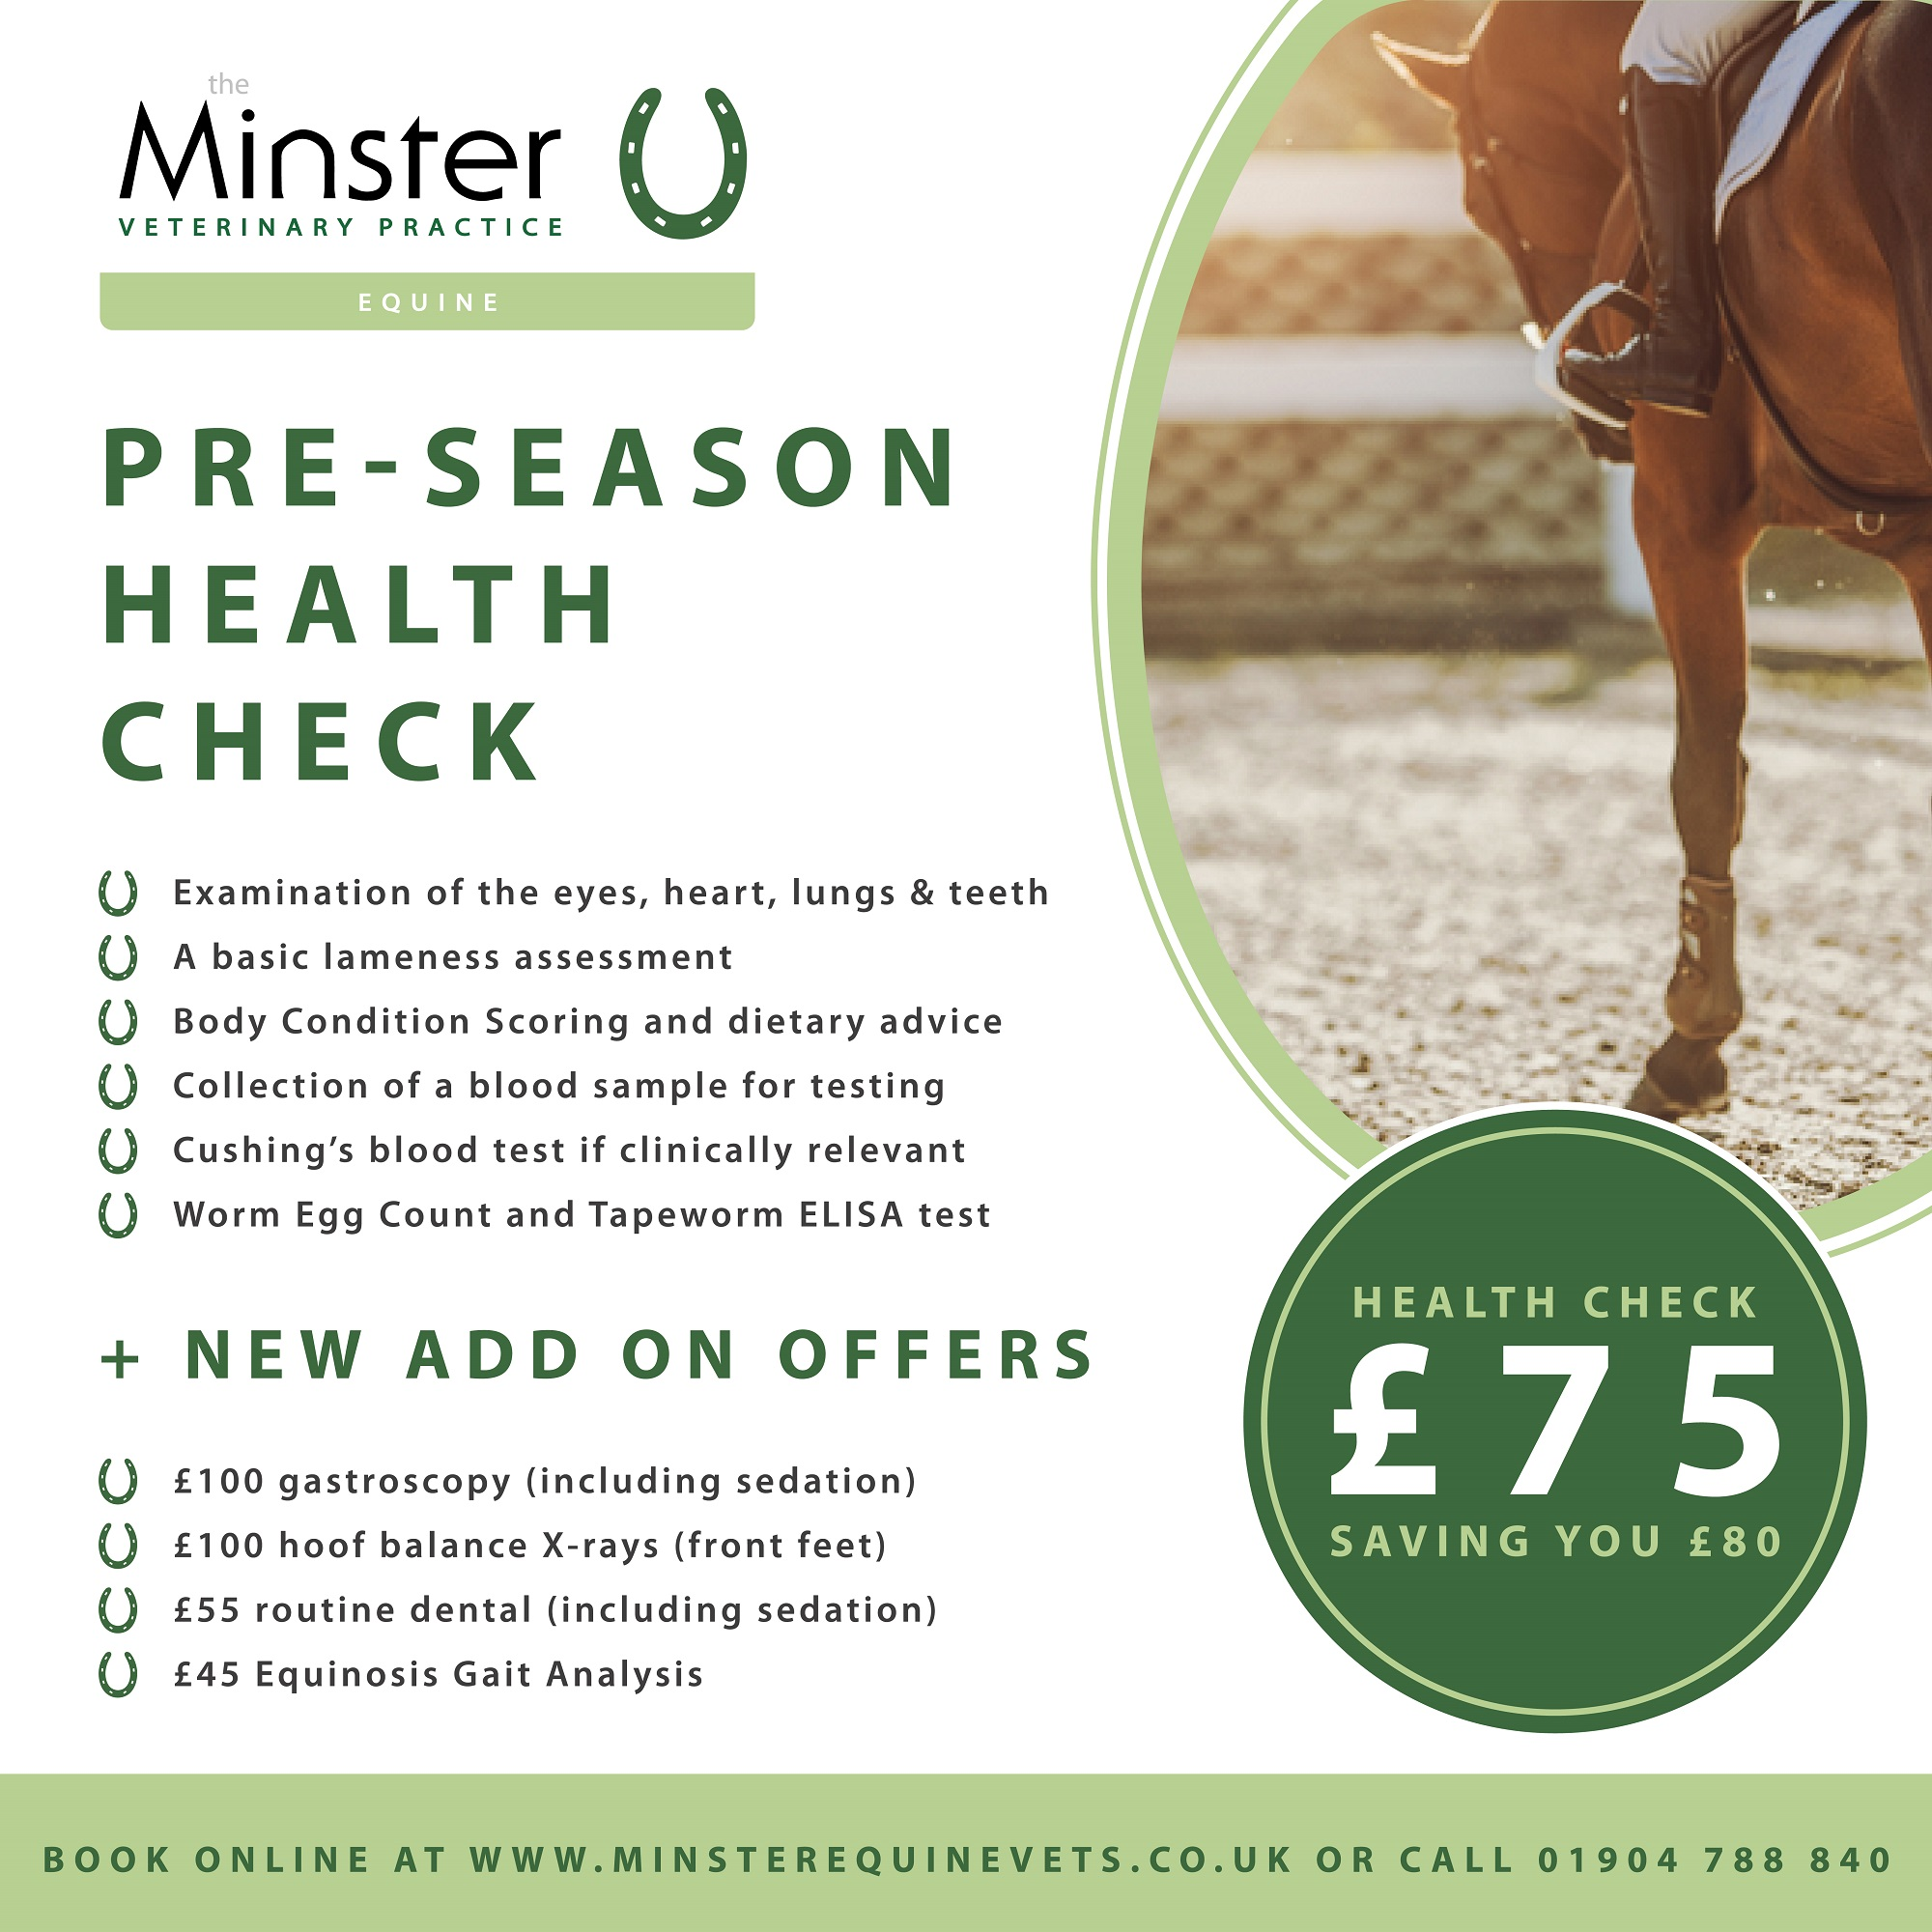 Pre-season Health Checks